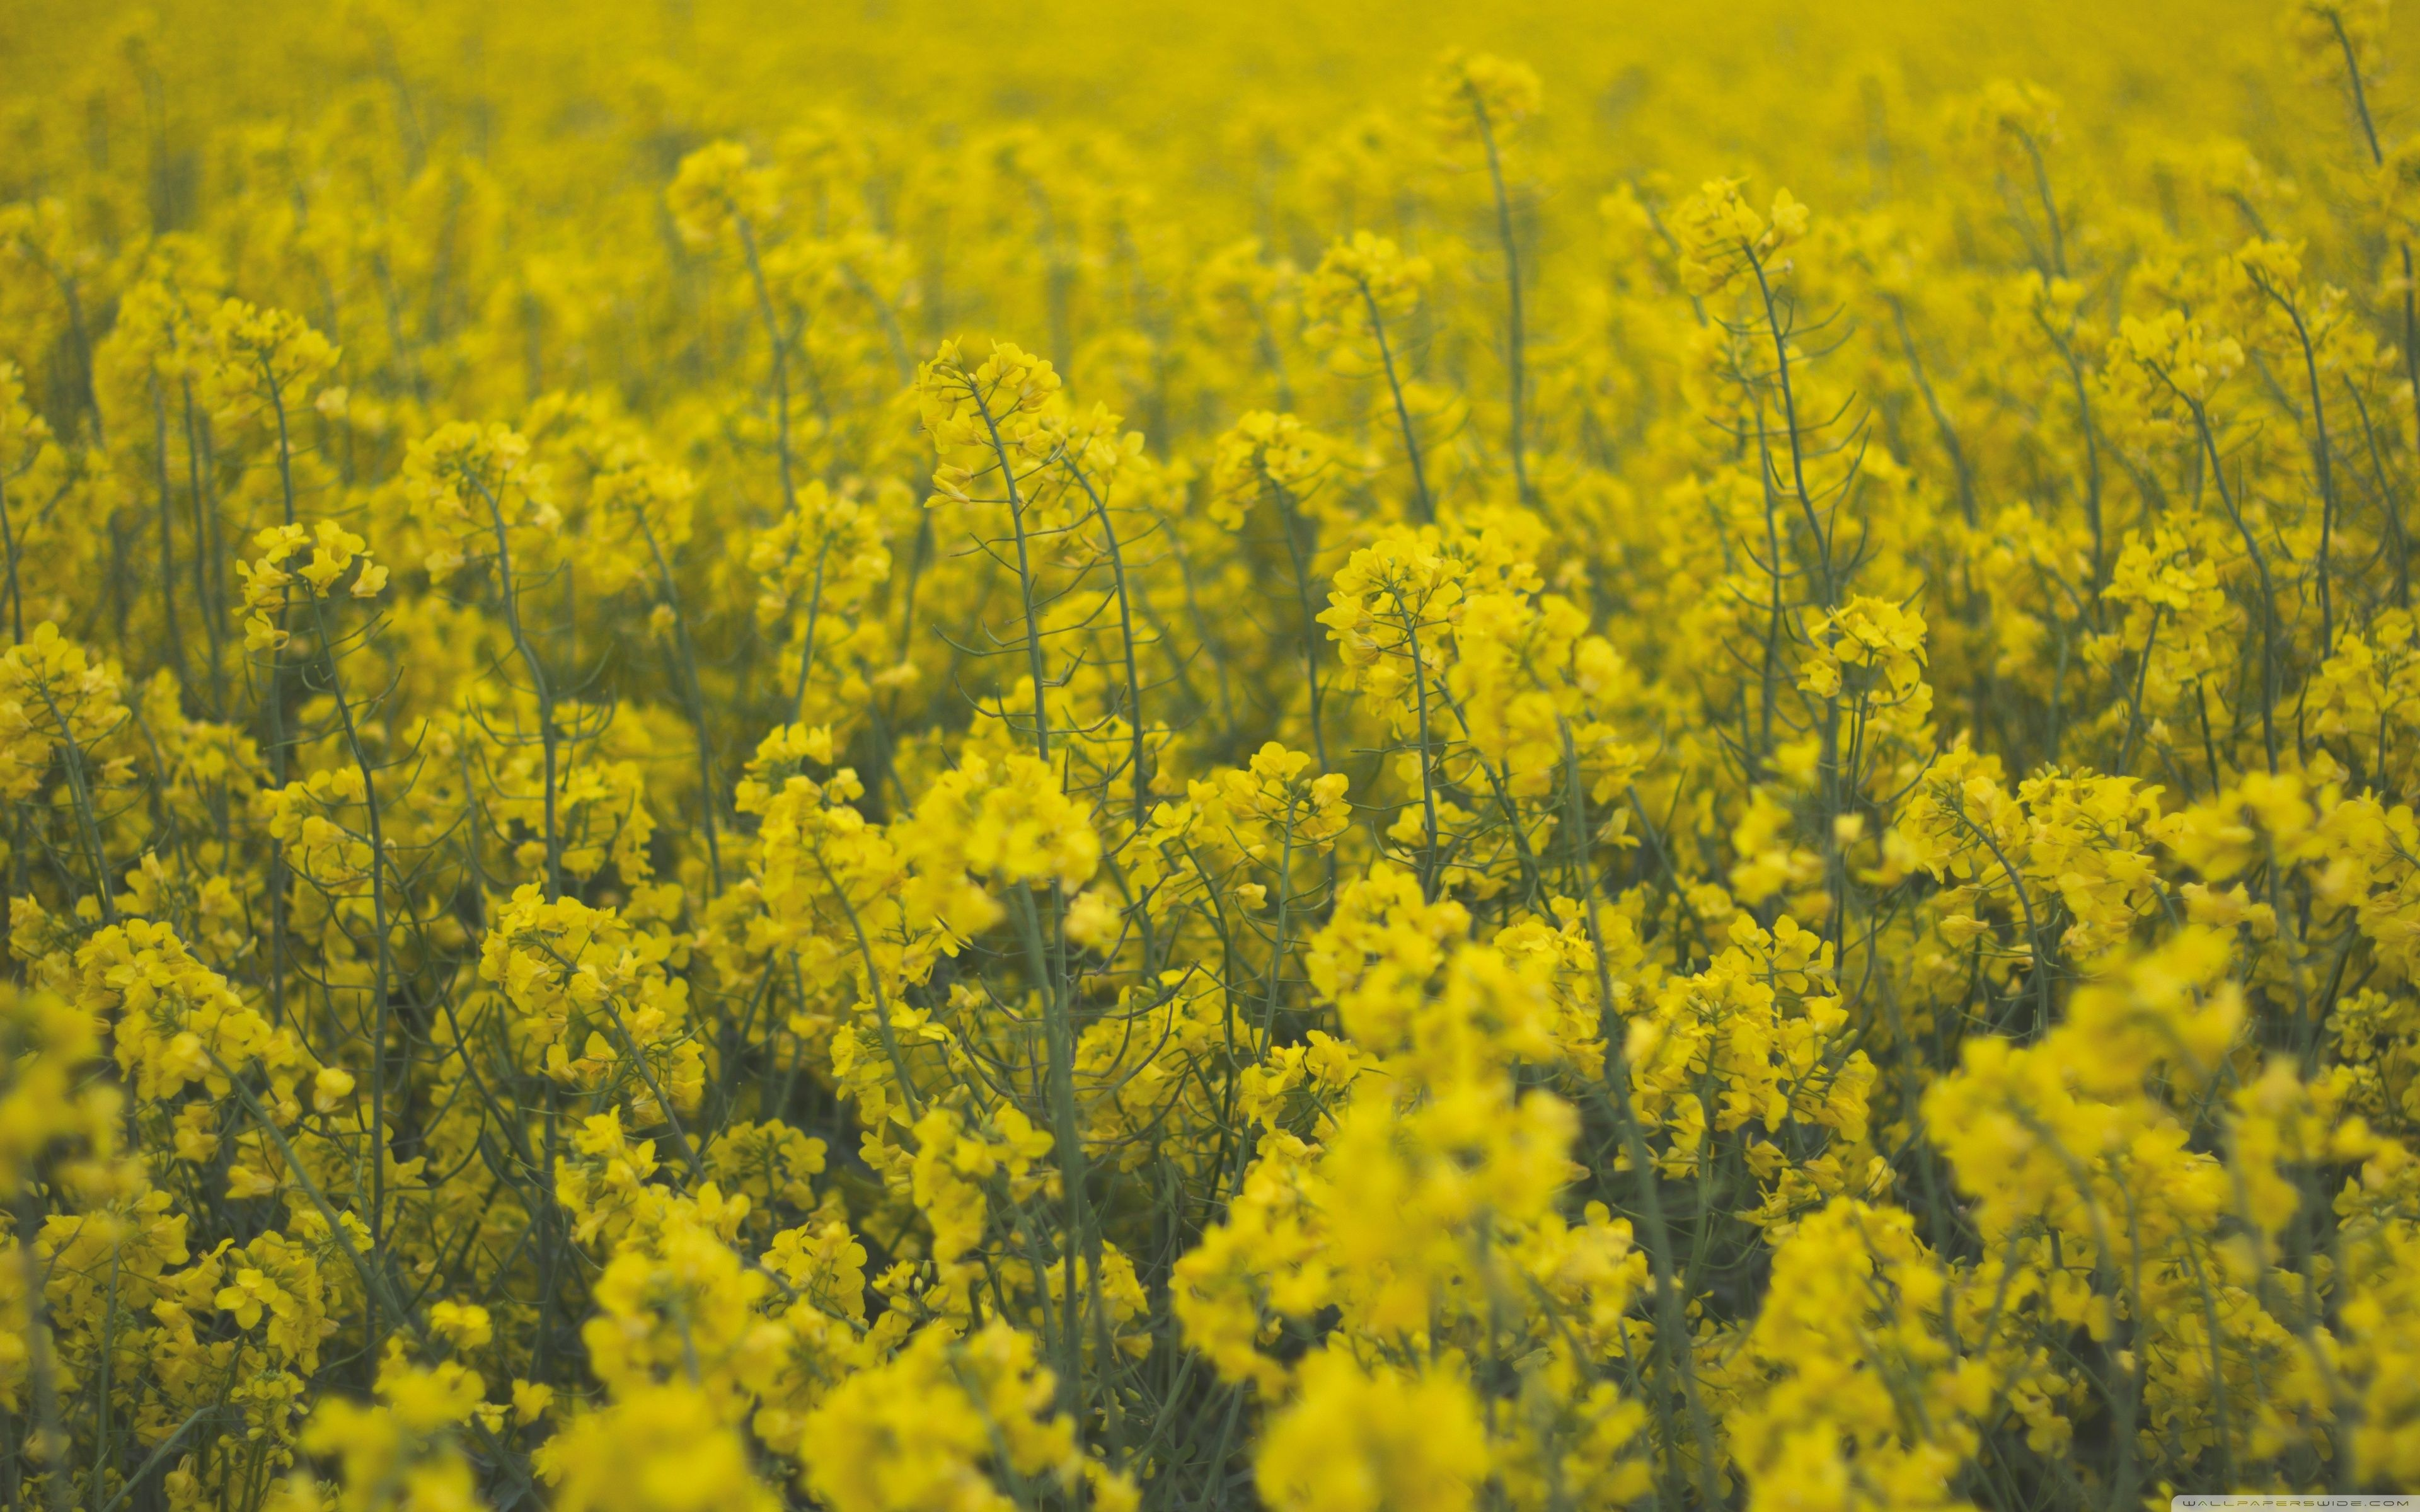 Mustard Flower Hd Wallpaper